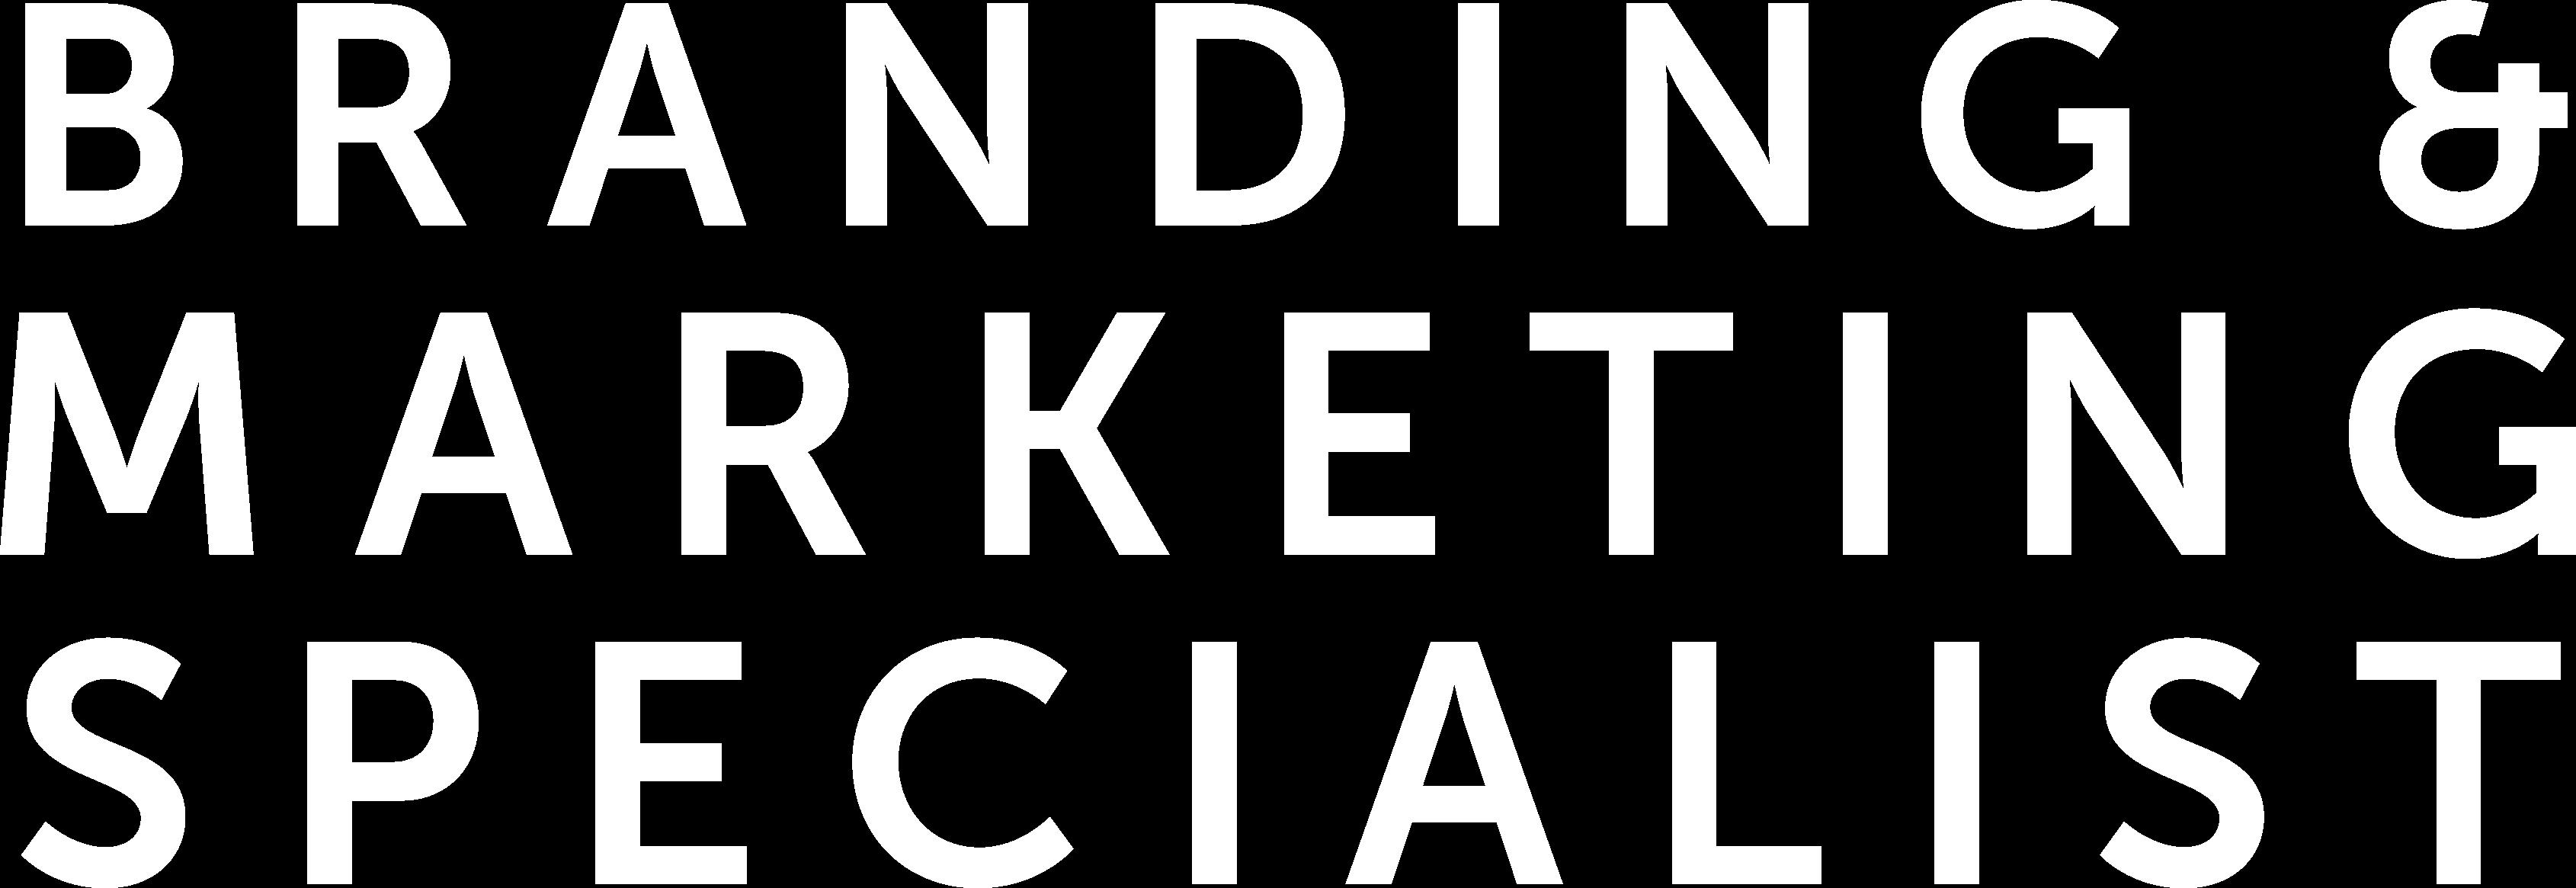 Branding marketing specialist